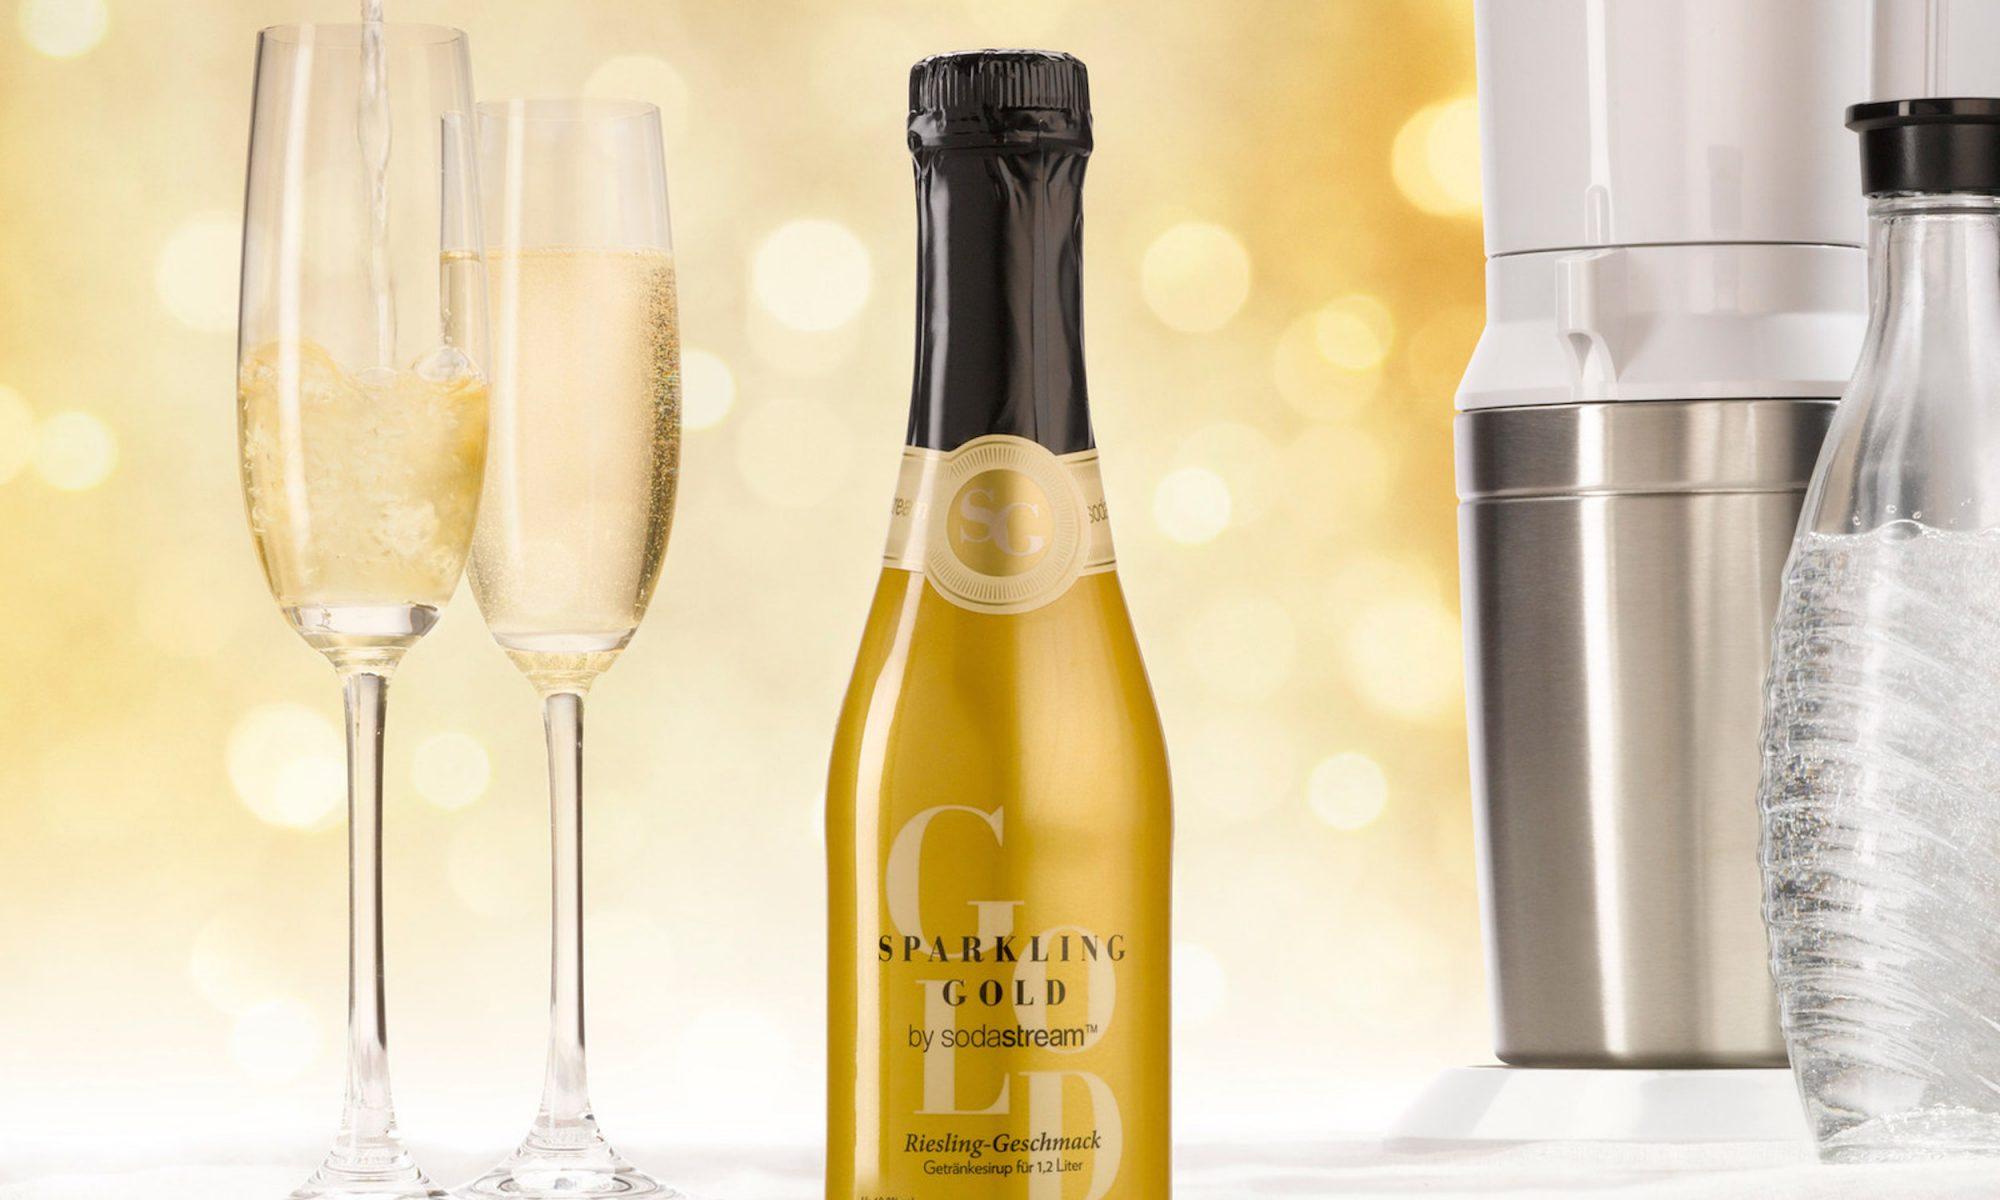 sodastream sparkling wine